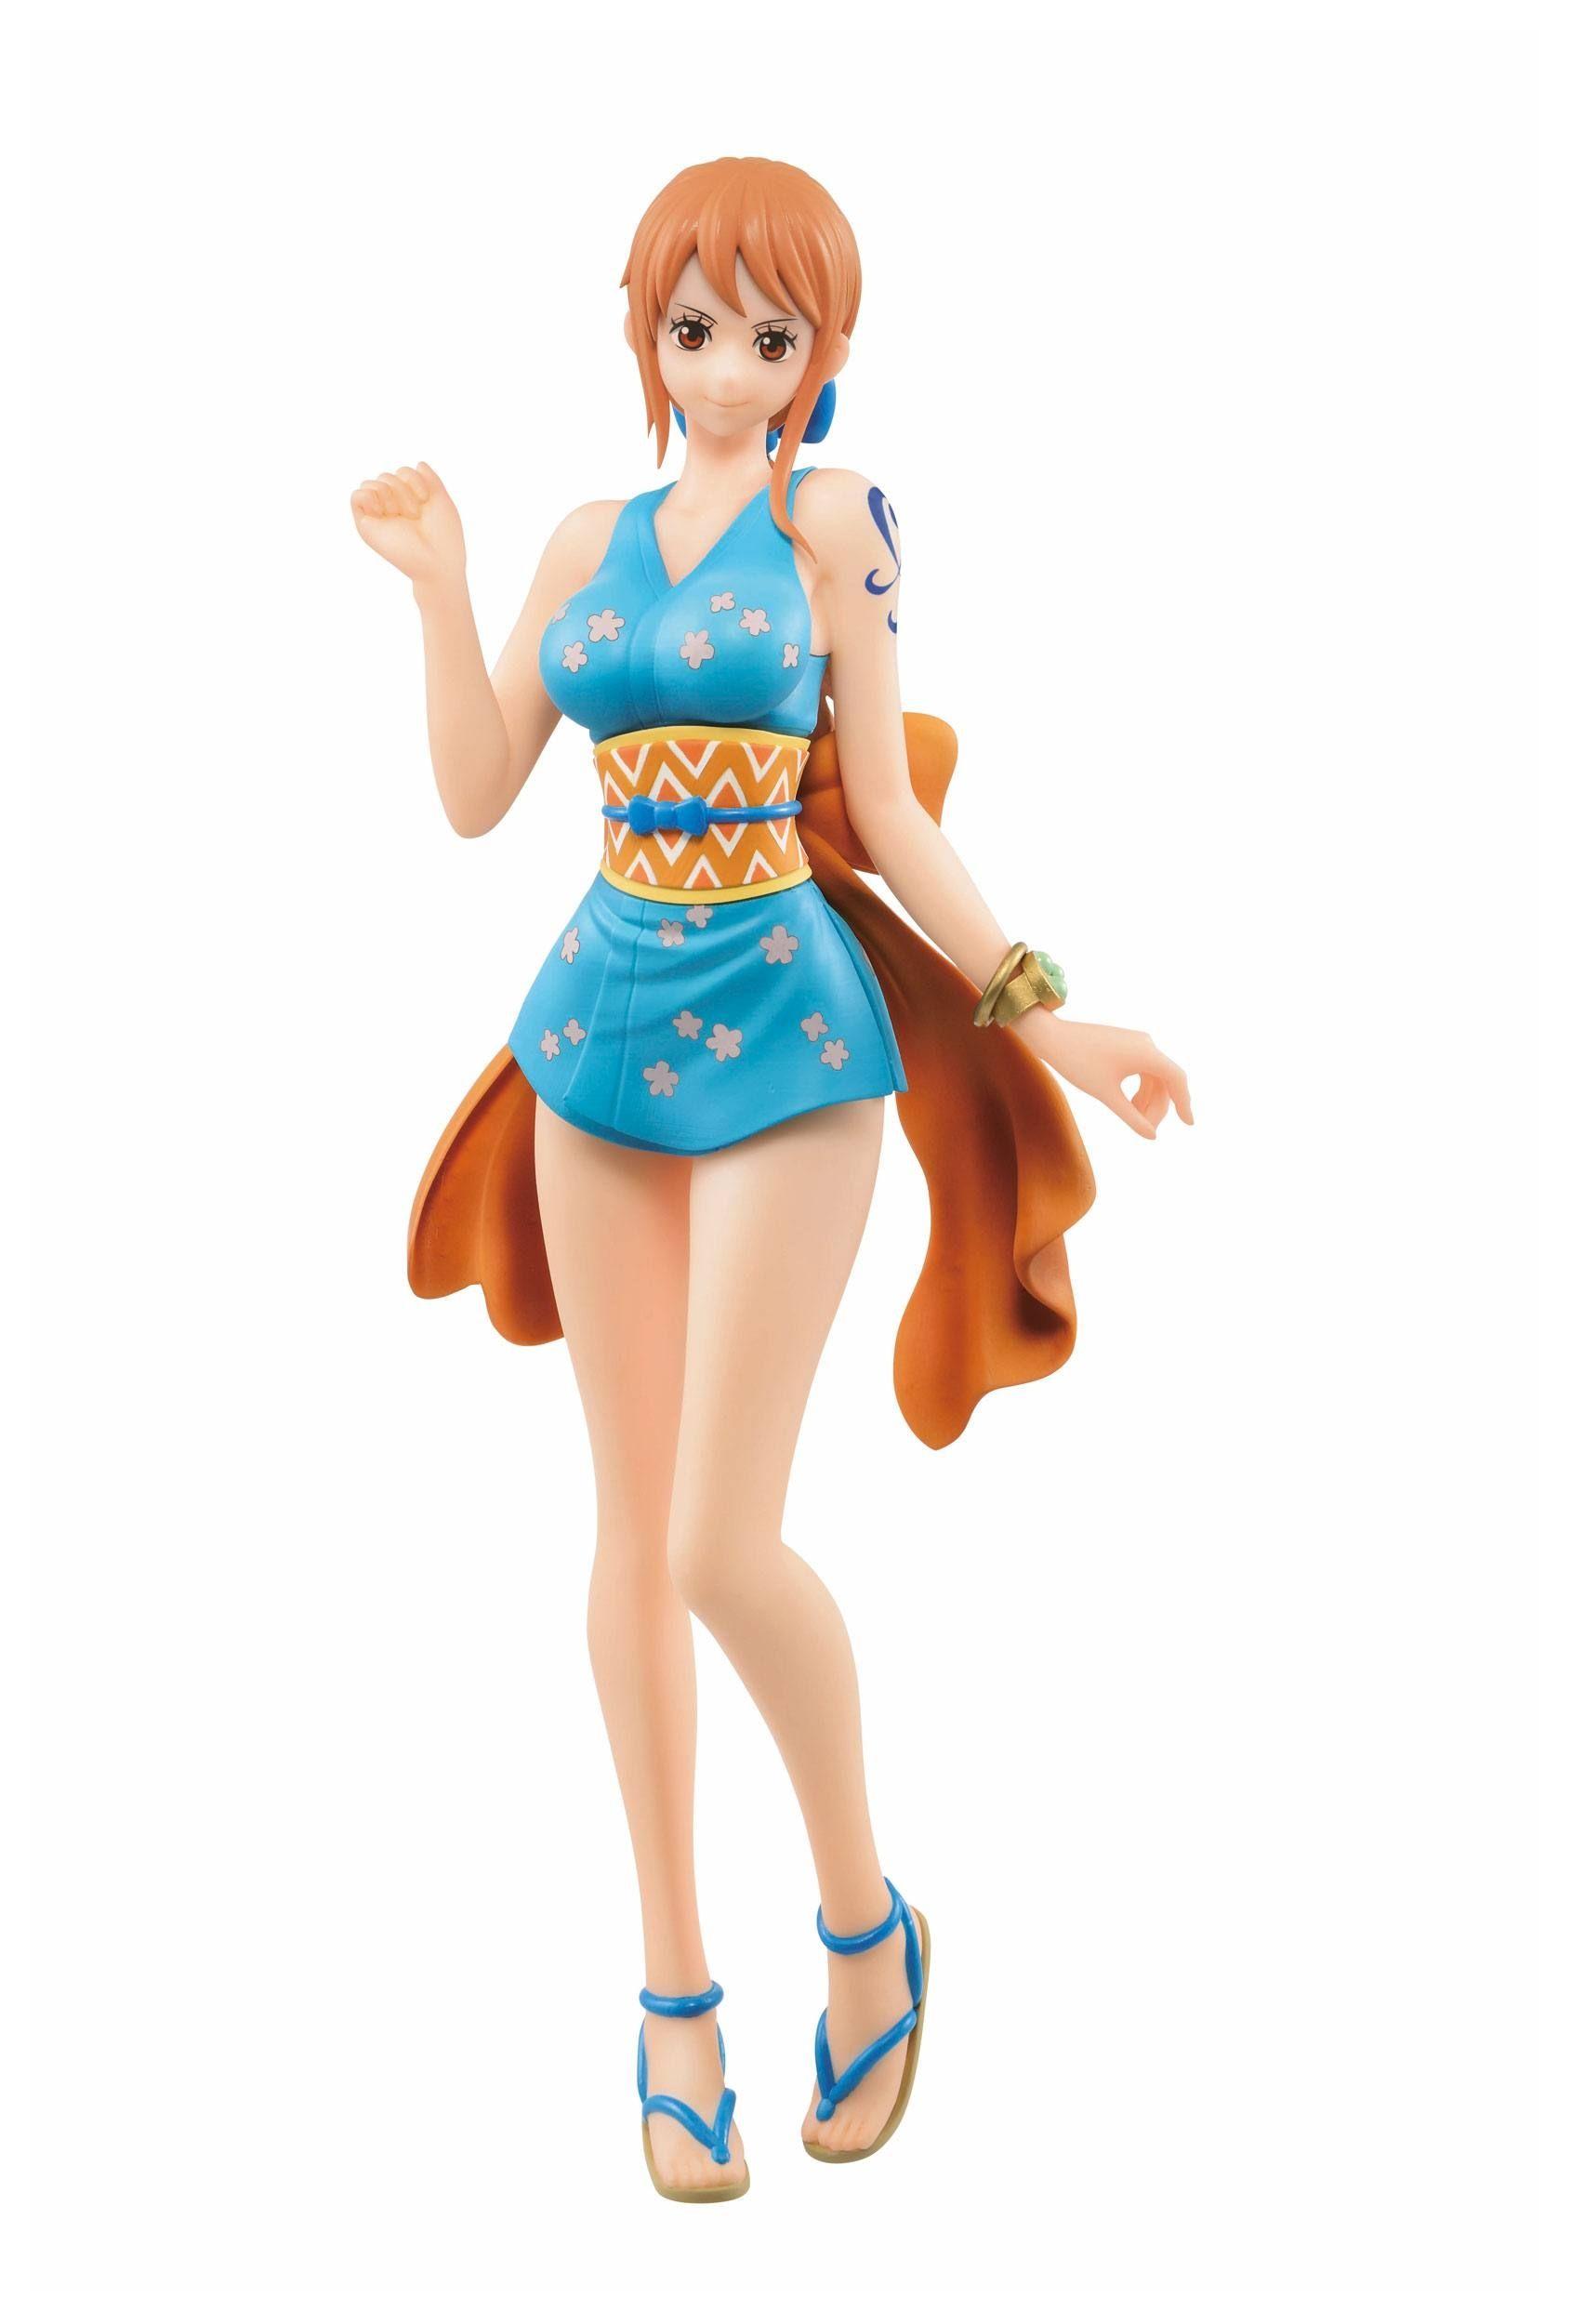 Anime One Piece Lady Edge Wedding Nami White Ver PVC Figure New In Box